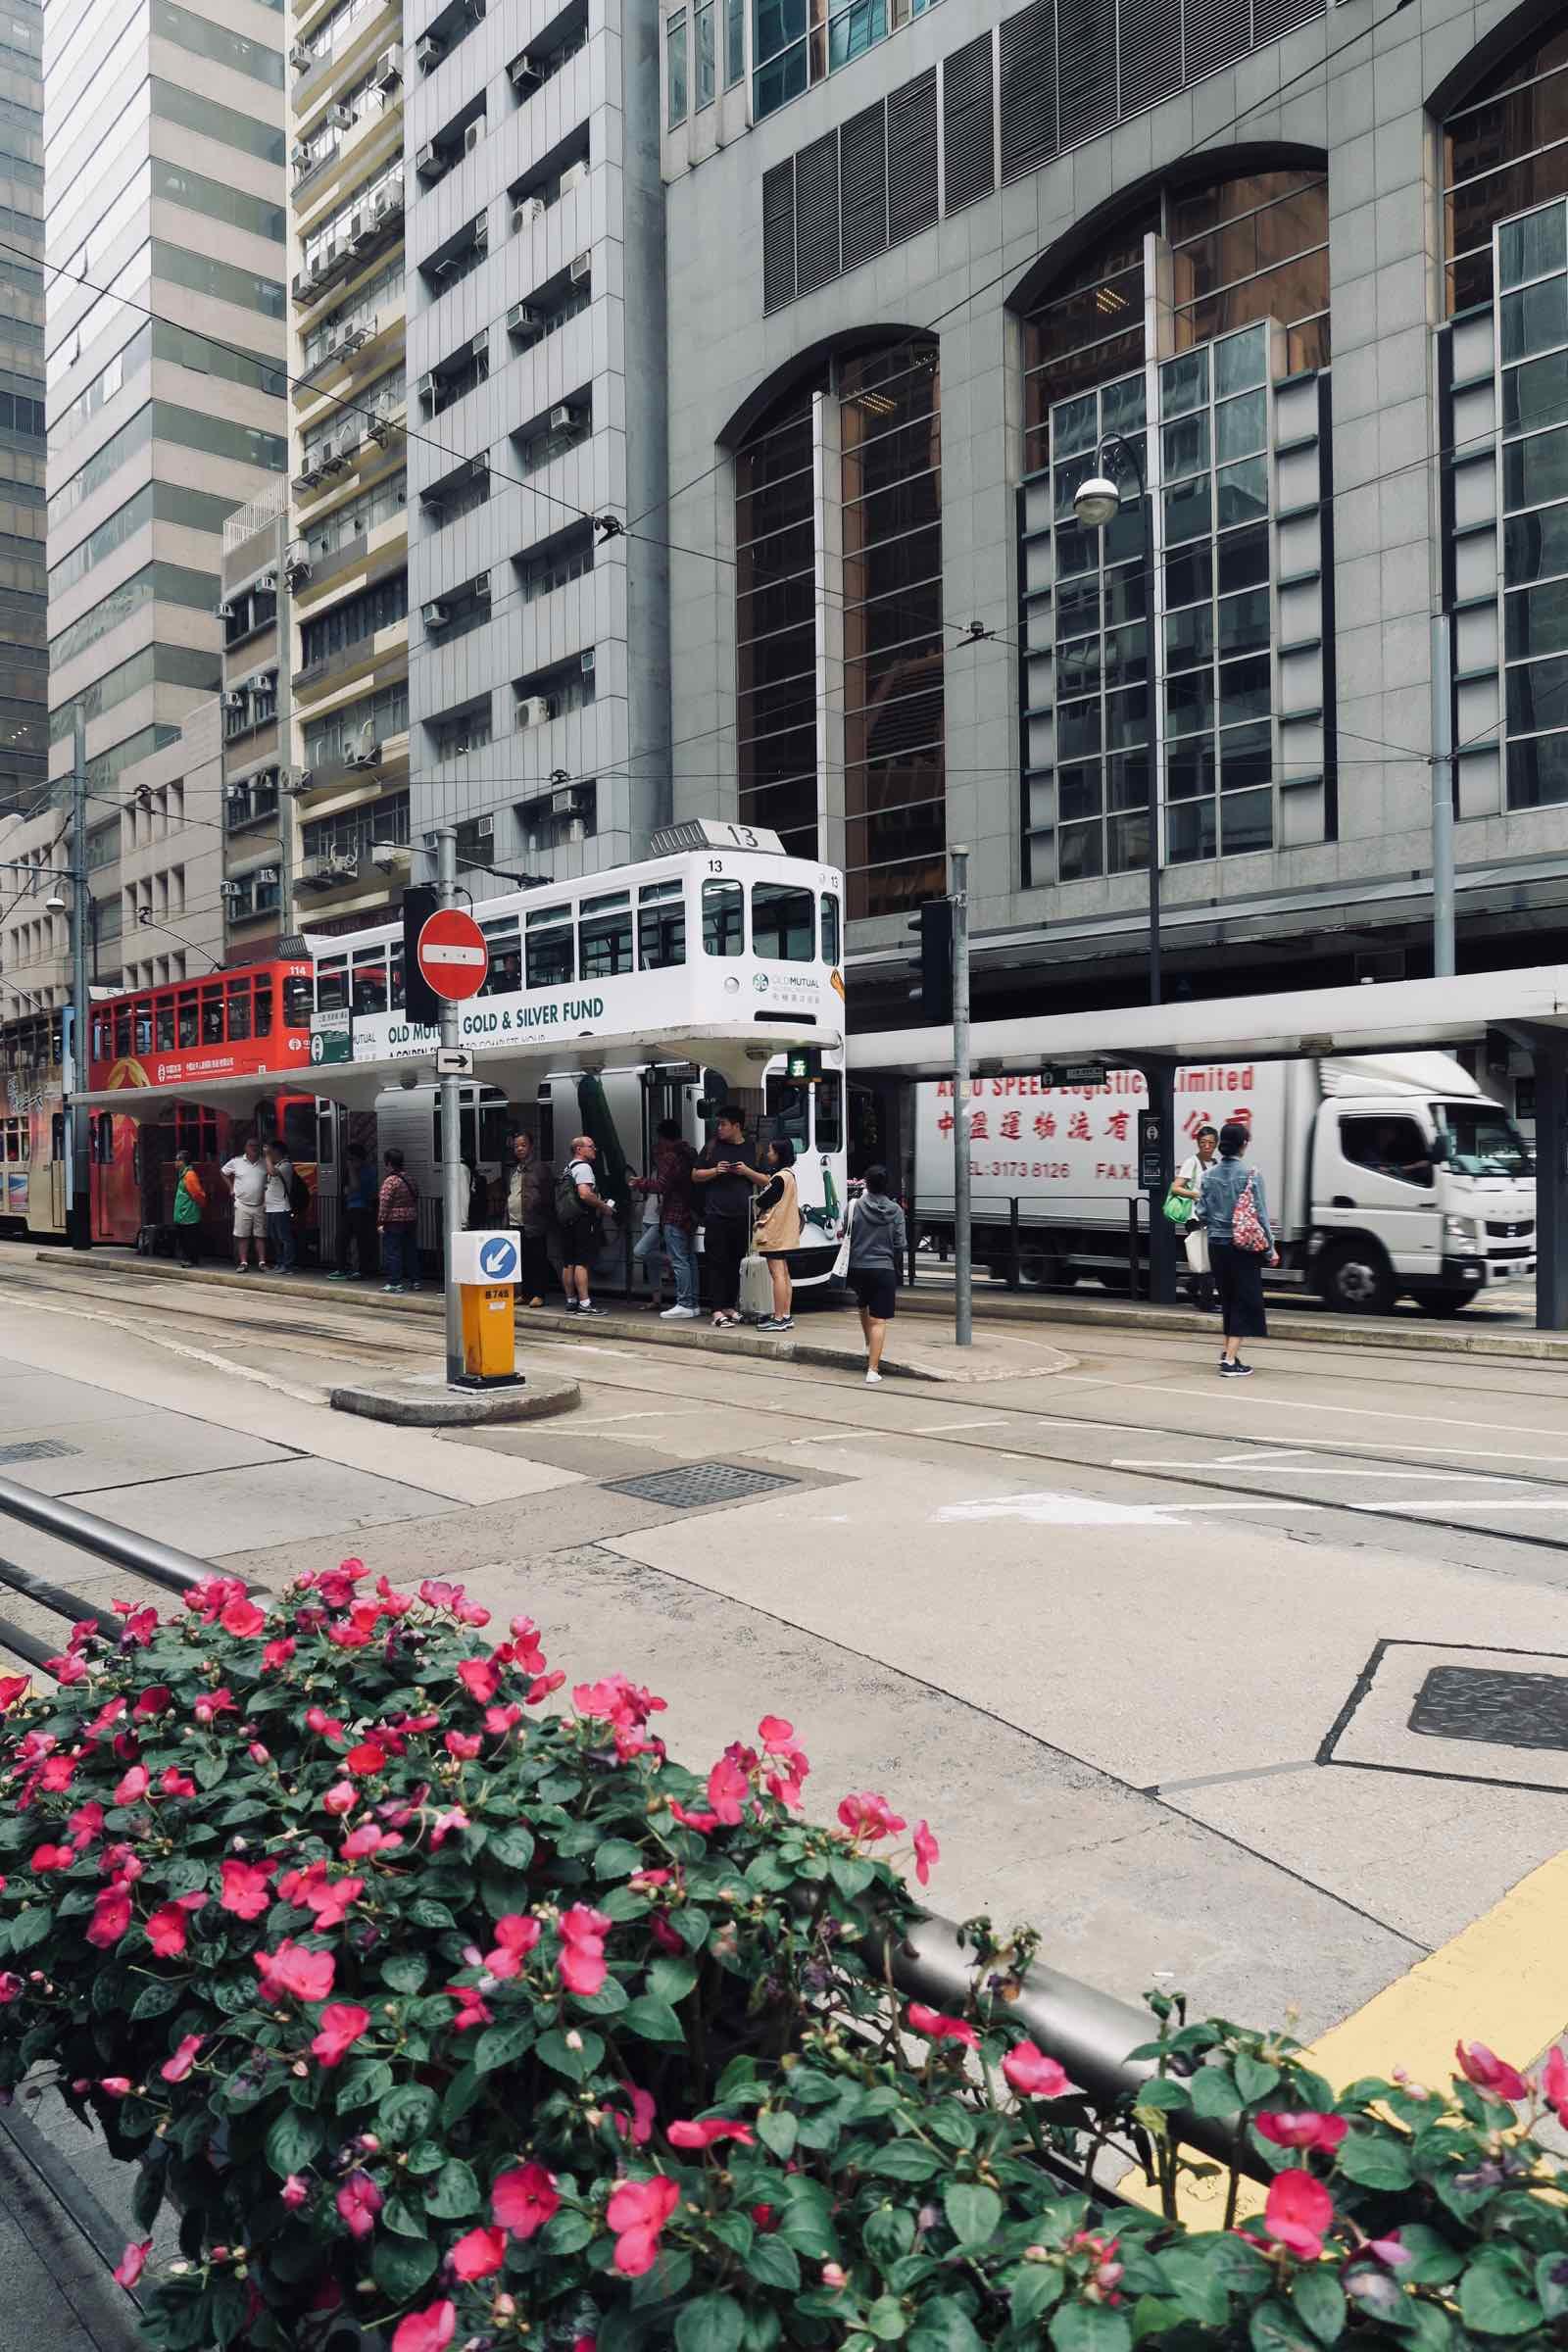 ding-ding-hong-kong-tram.jpg